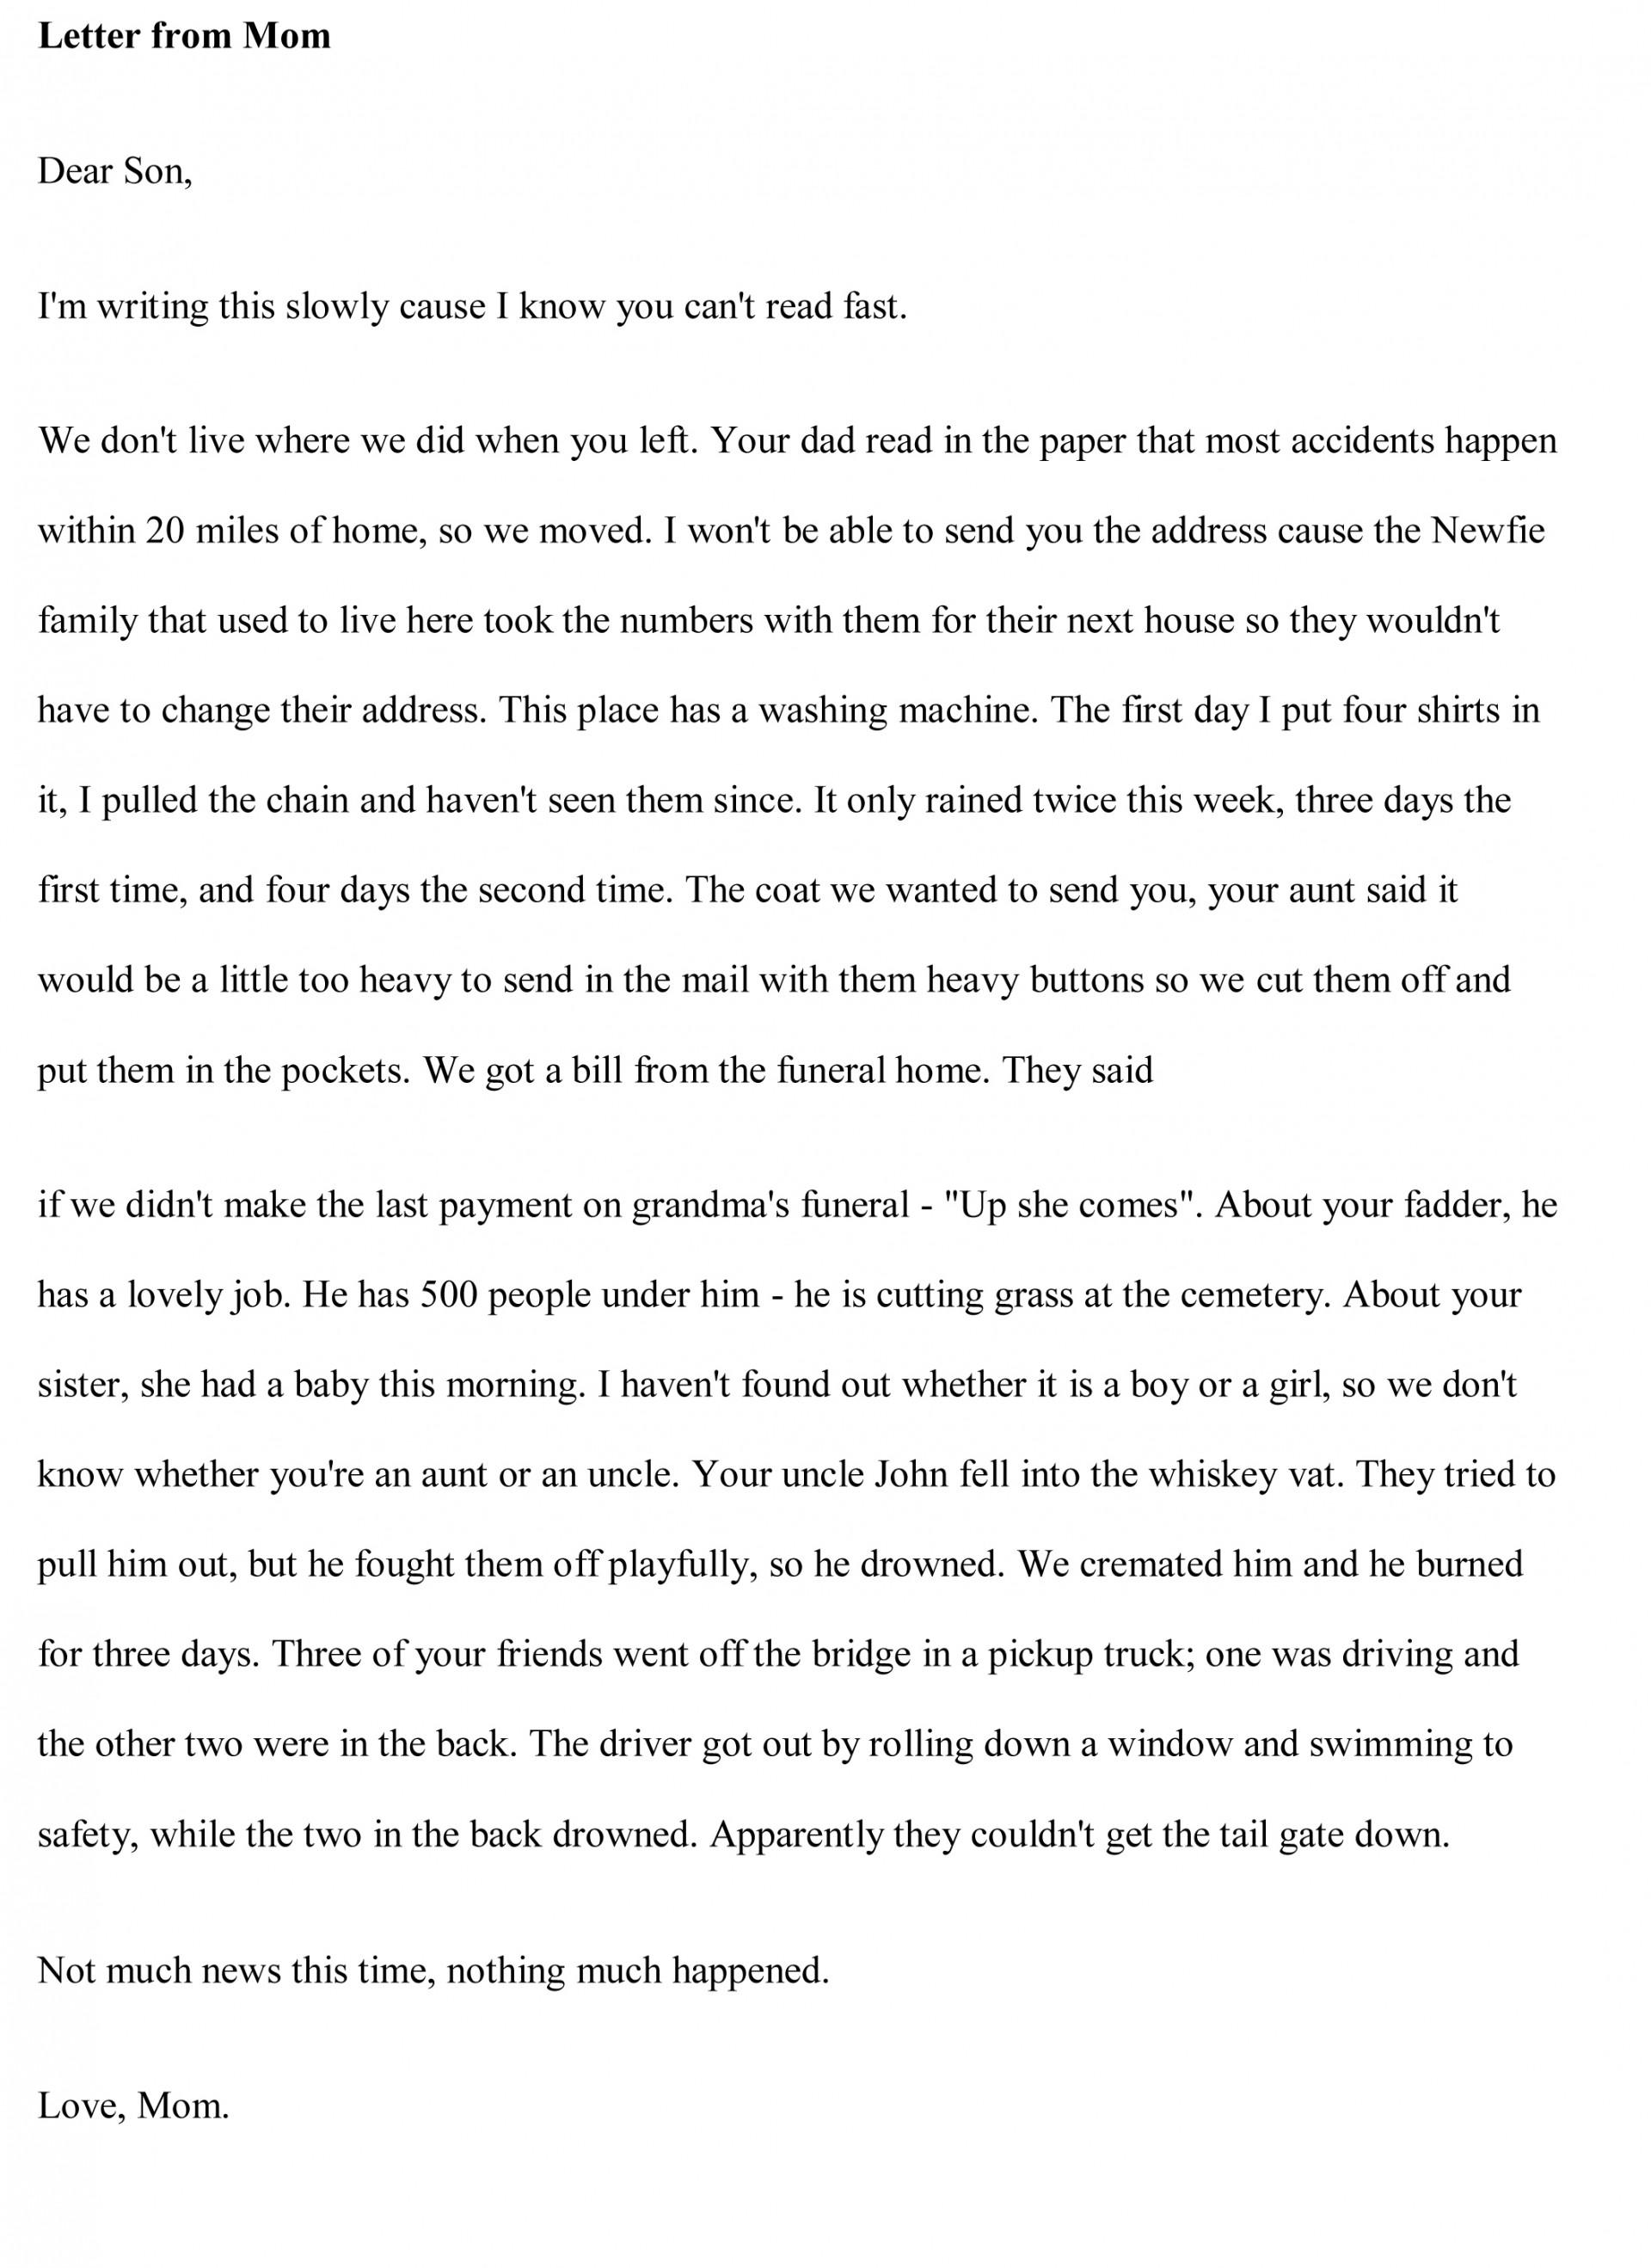 015 Interesting Essay Topics Example Funny Free Amazing For Grade 7 9 Pat 7th 1920